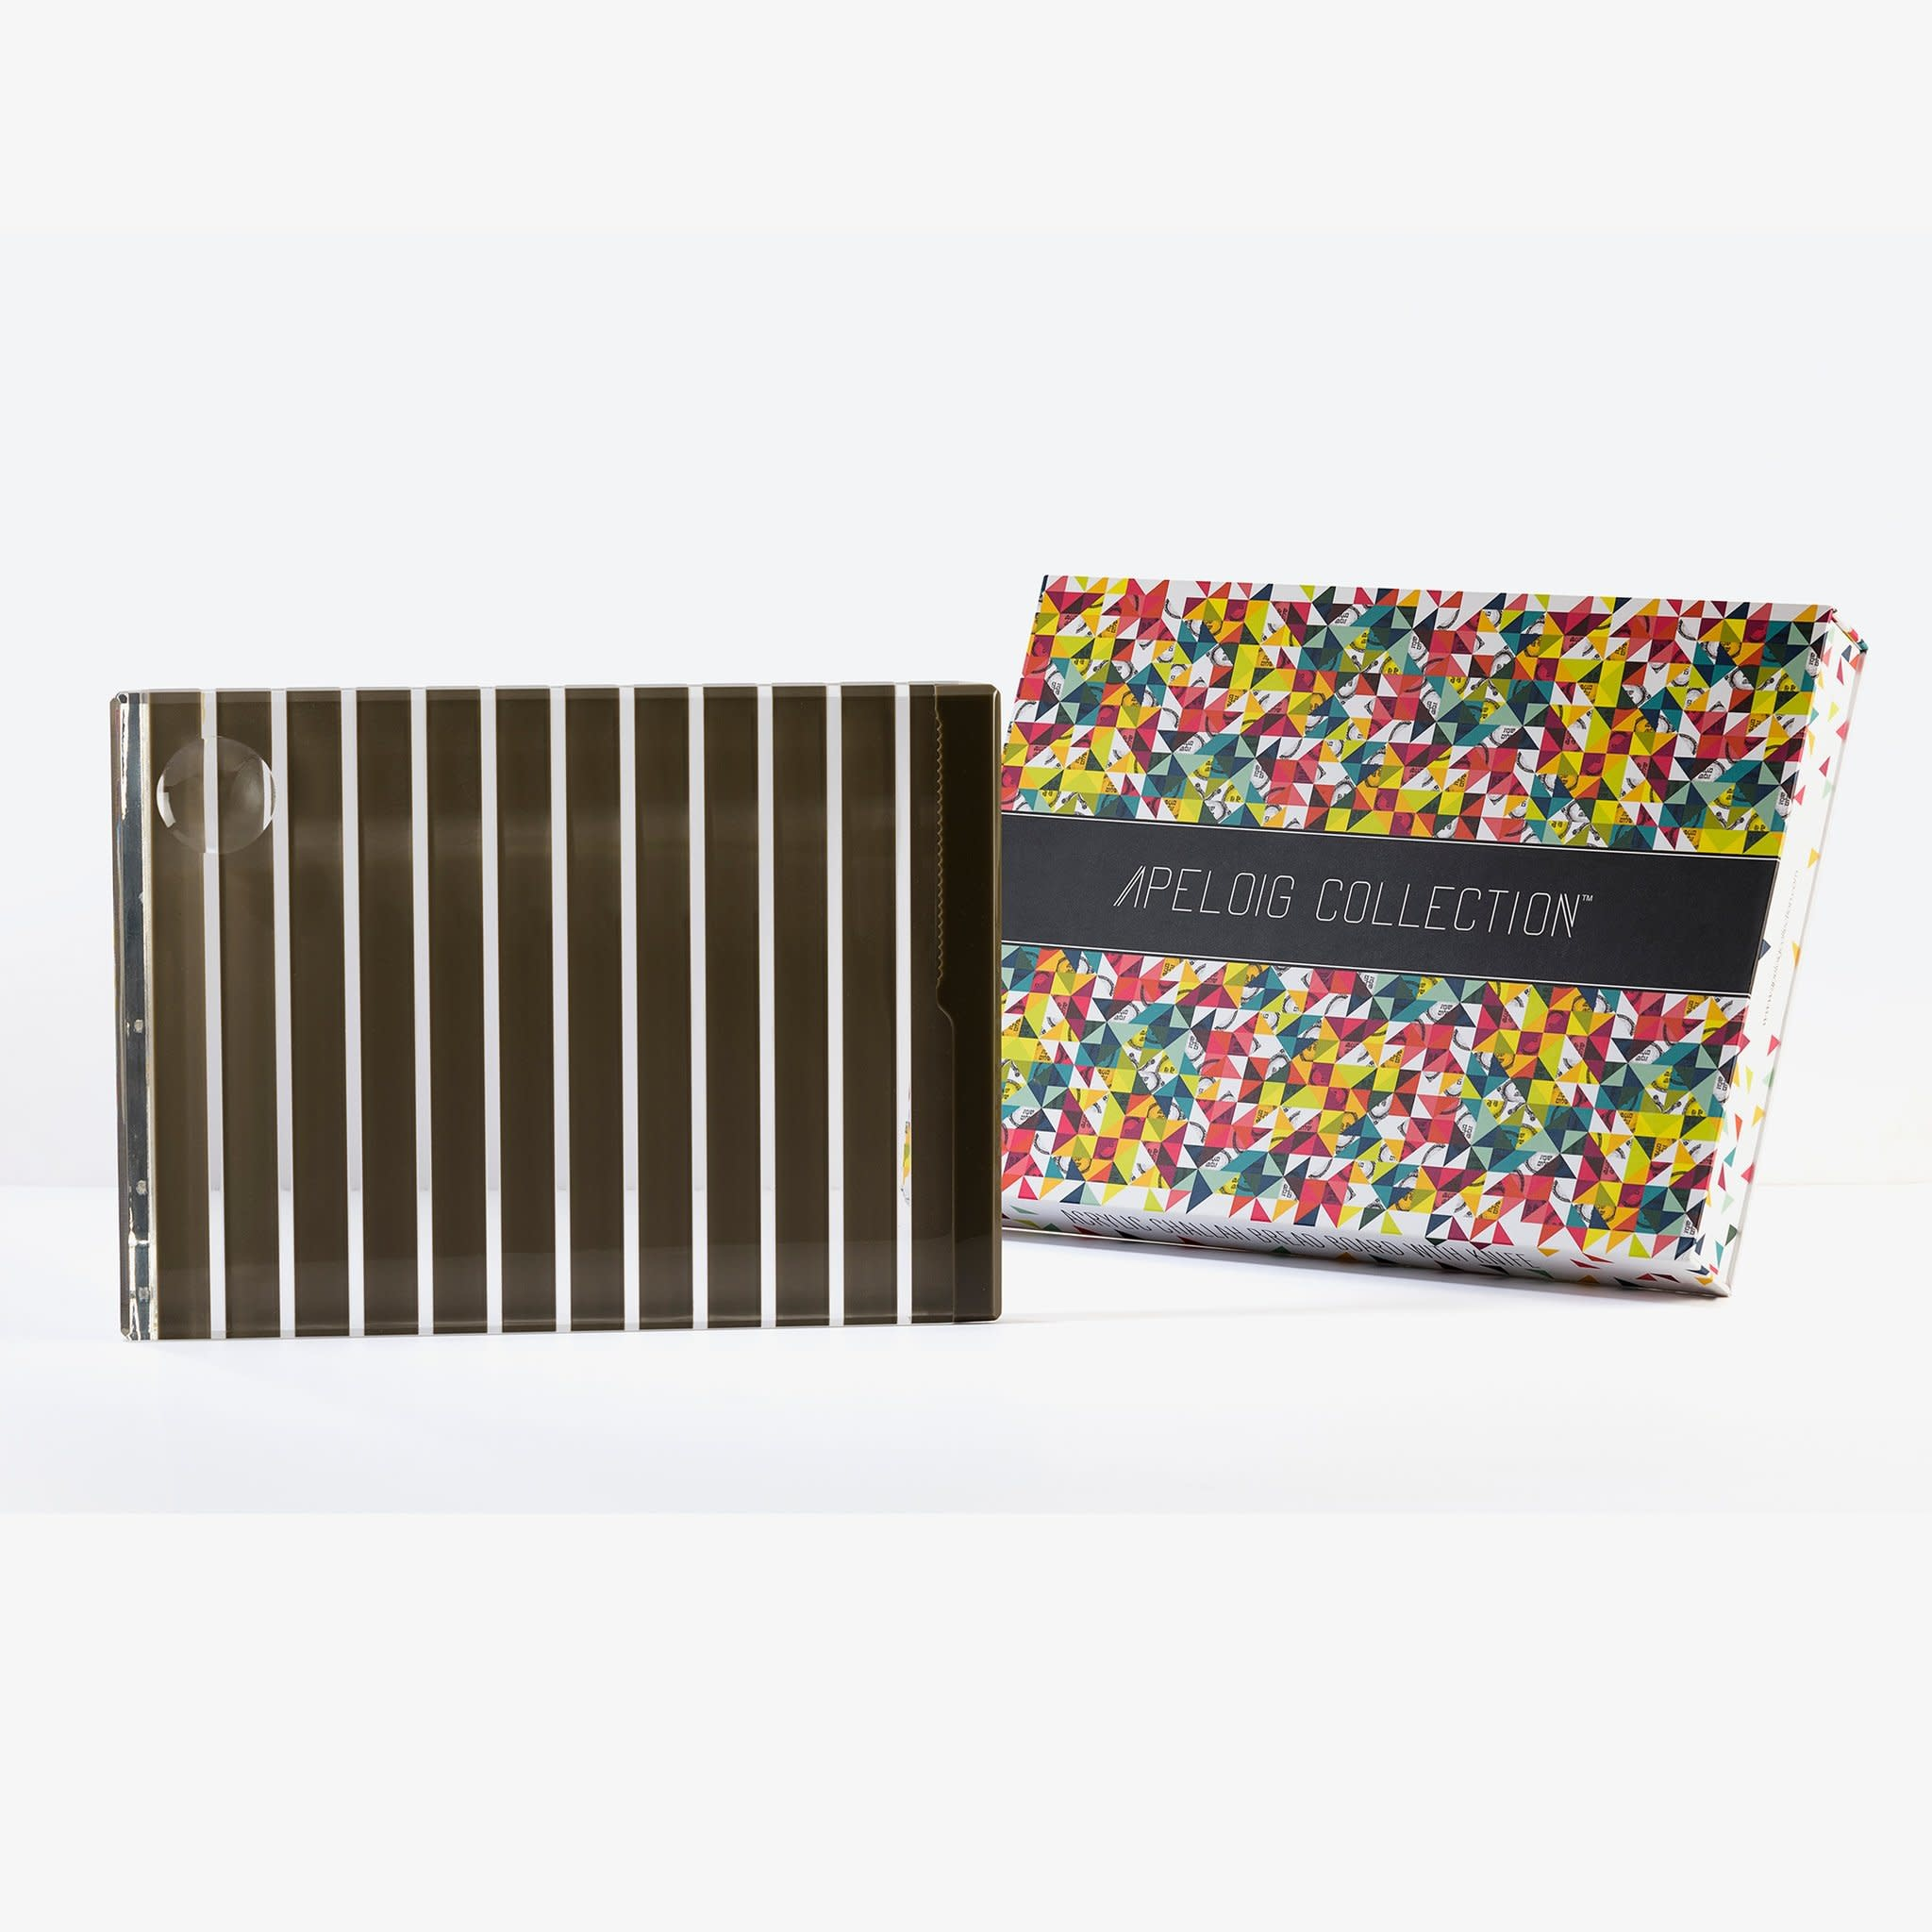 Apeloig Collection Grey Striped Acrylic Challah Board